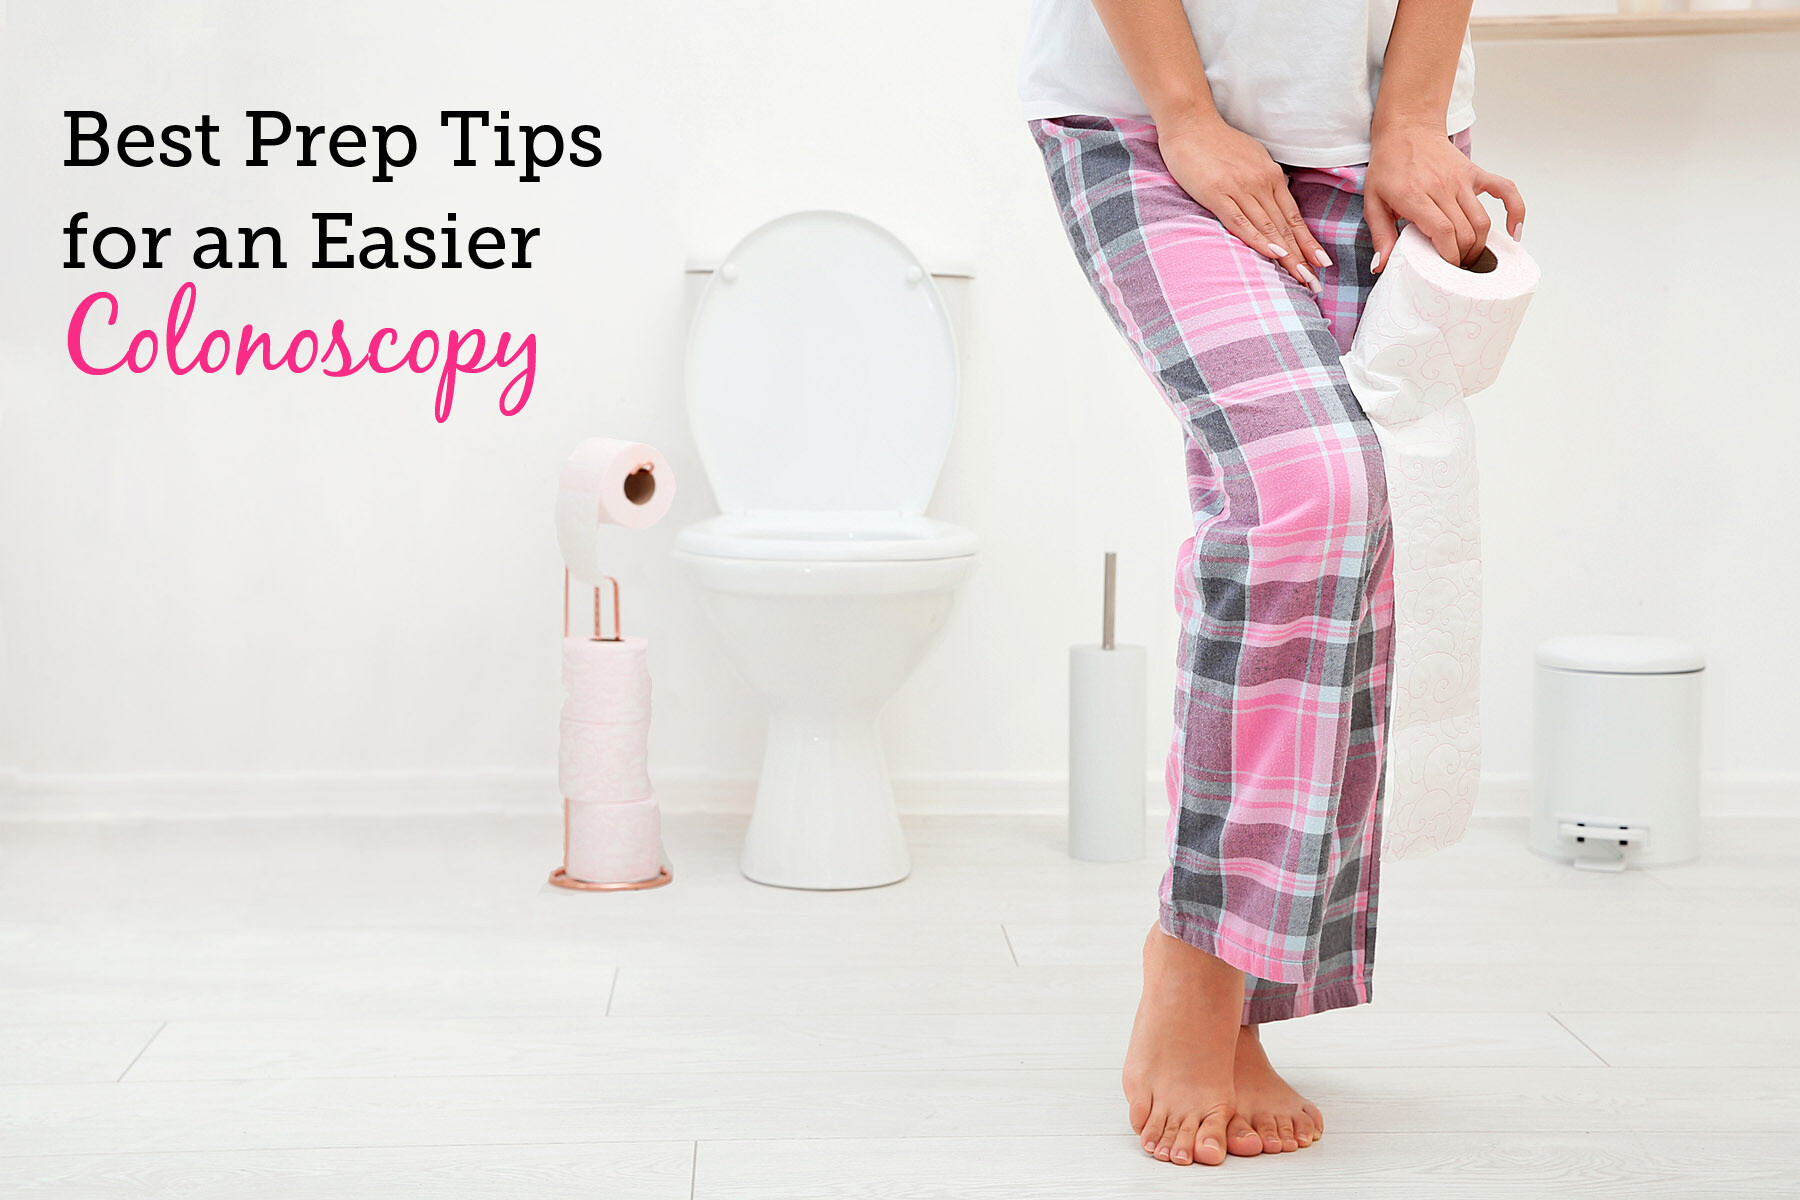 The Best Prep Tips for an Easier Colonoscopy